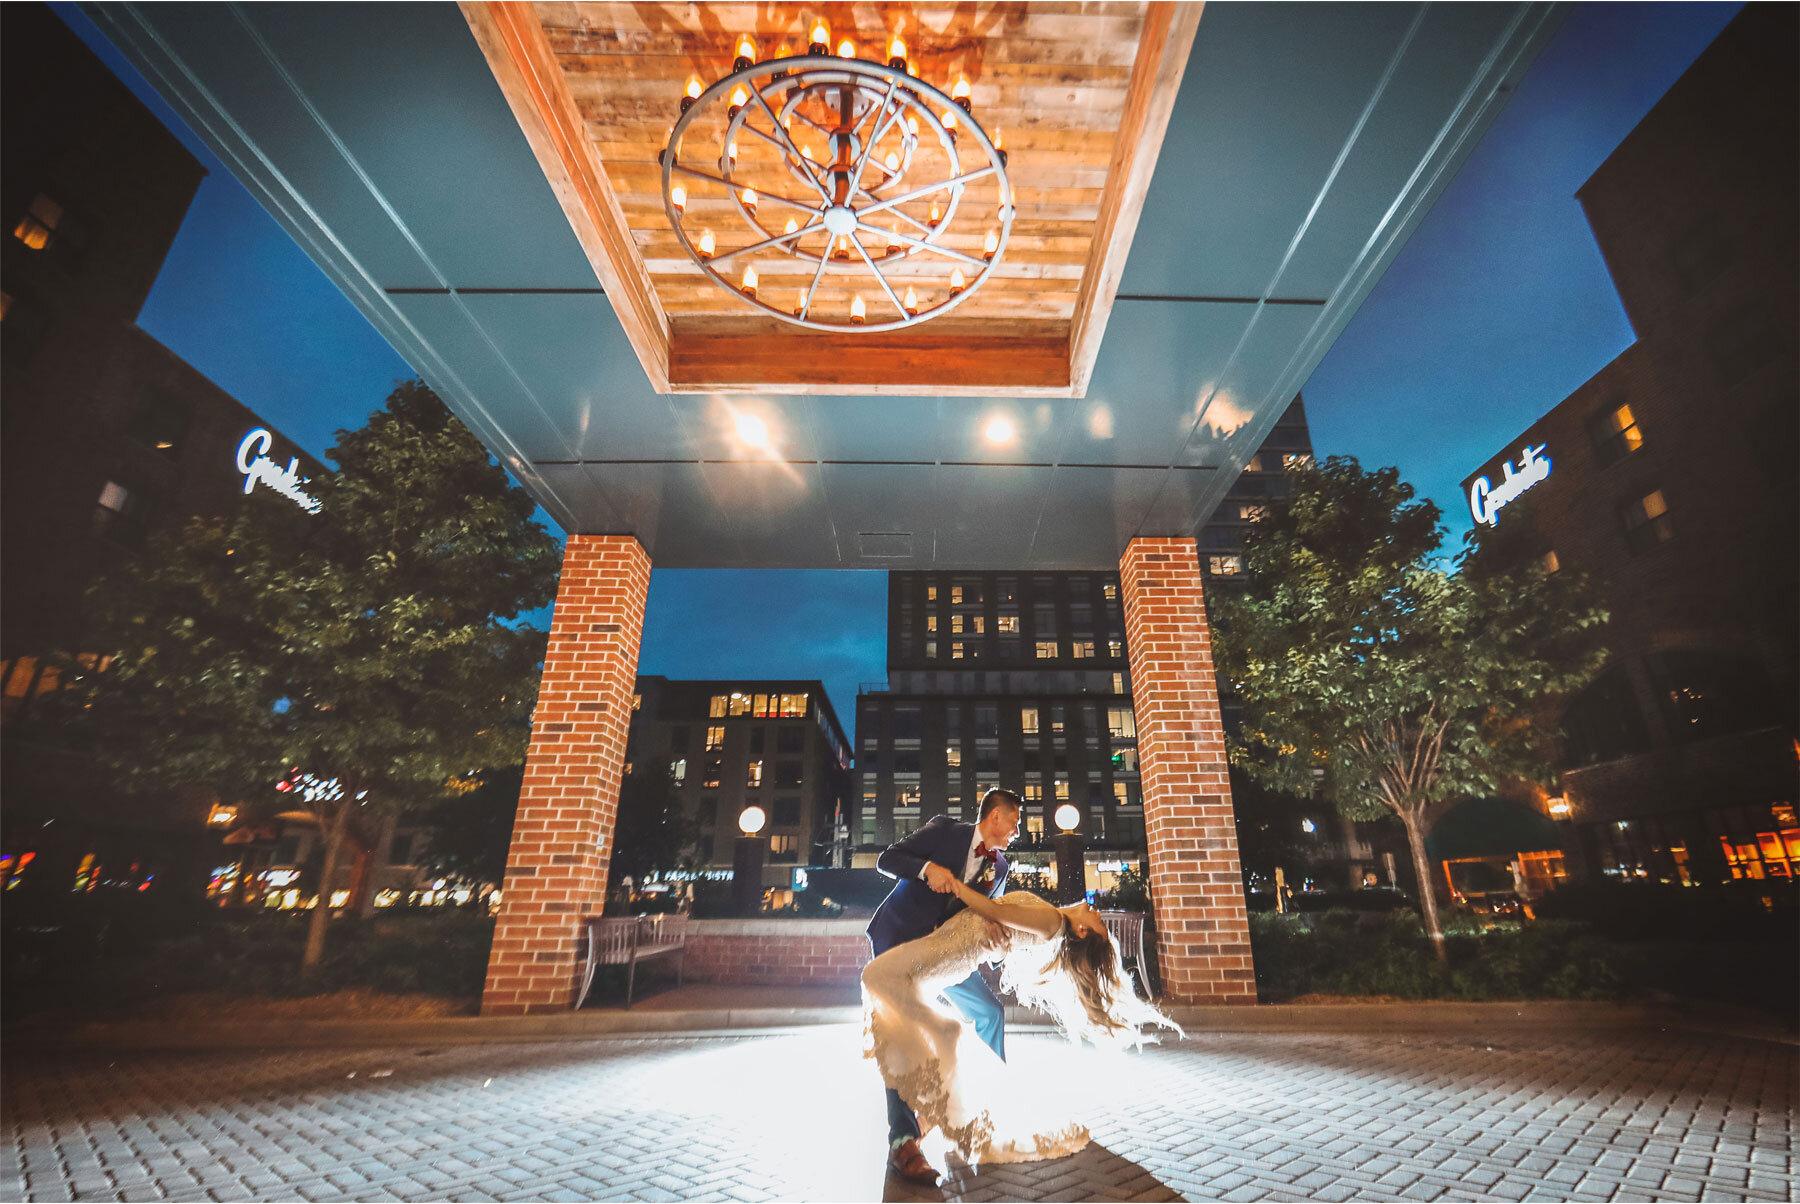 18-Vick-Photography-Minneapolis-Minnesota-The-Graduate-Hotel-Exterior-Night-Bride-Groom-Kiss-Mai-&-Ross.jpg